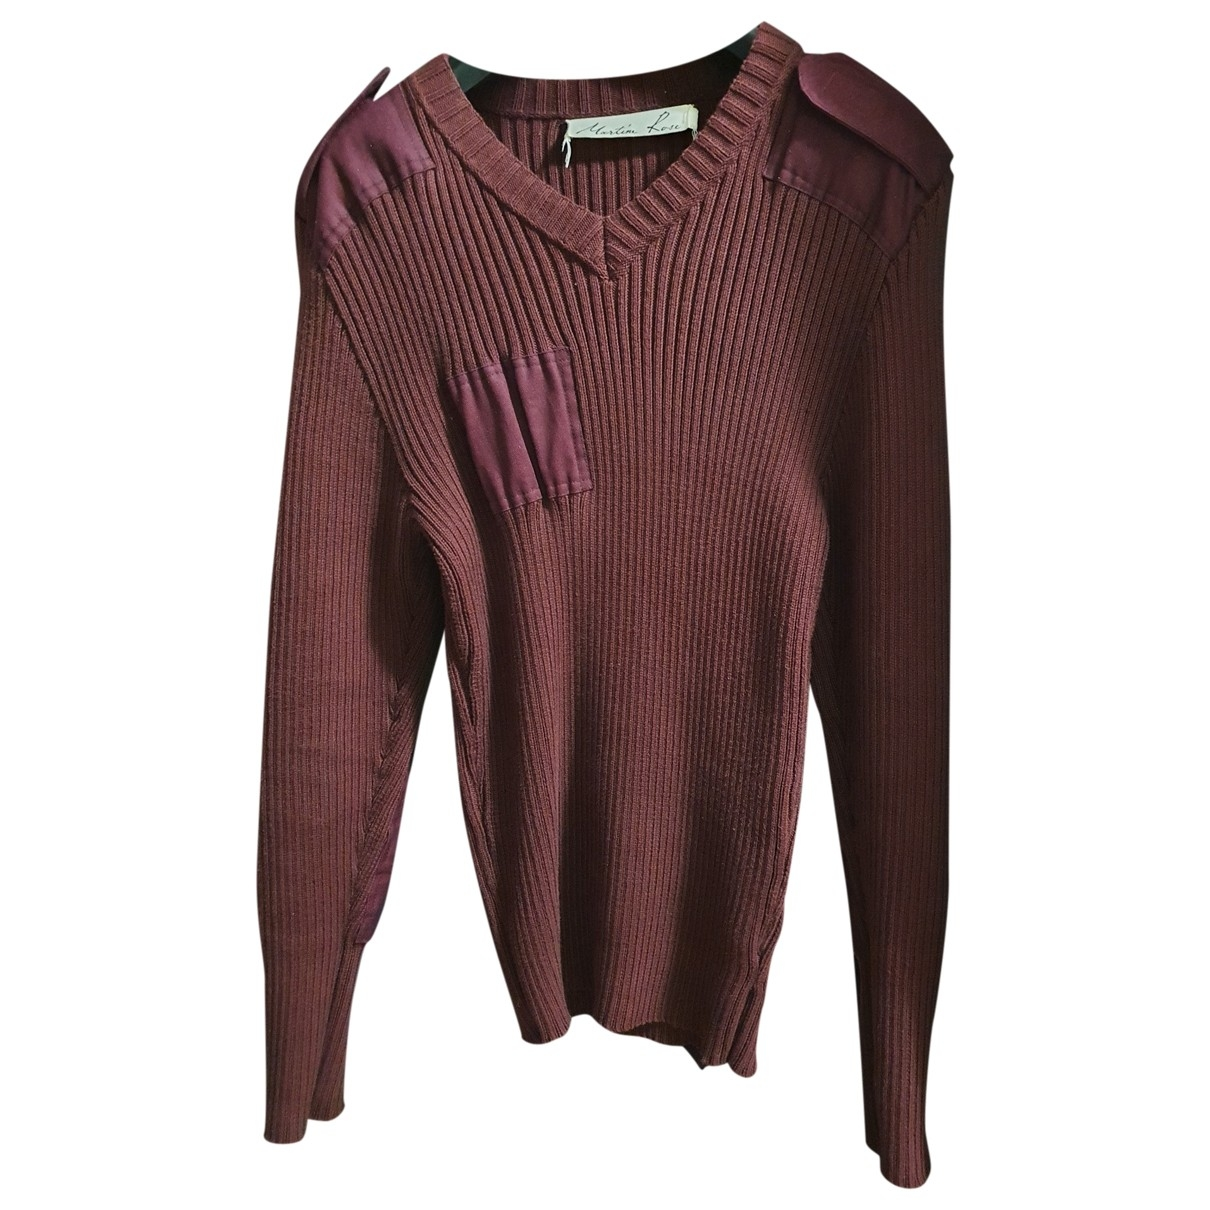 Martine Rose \N Burgundy Cotton Knitwear & Sweatshirts for Men L International